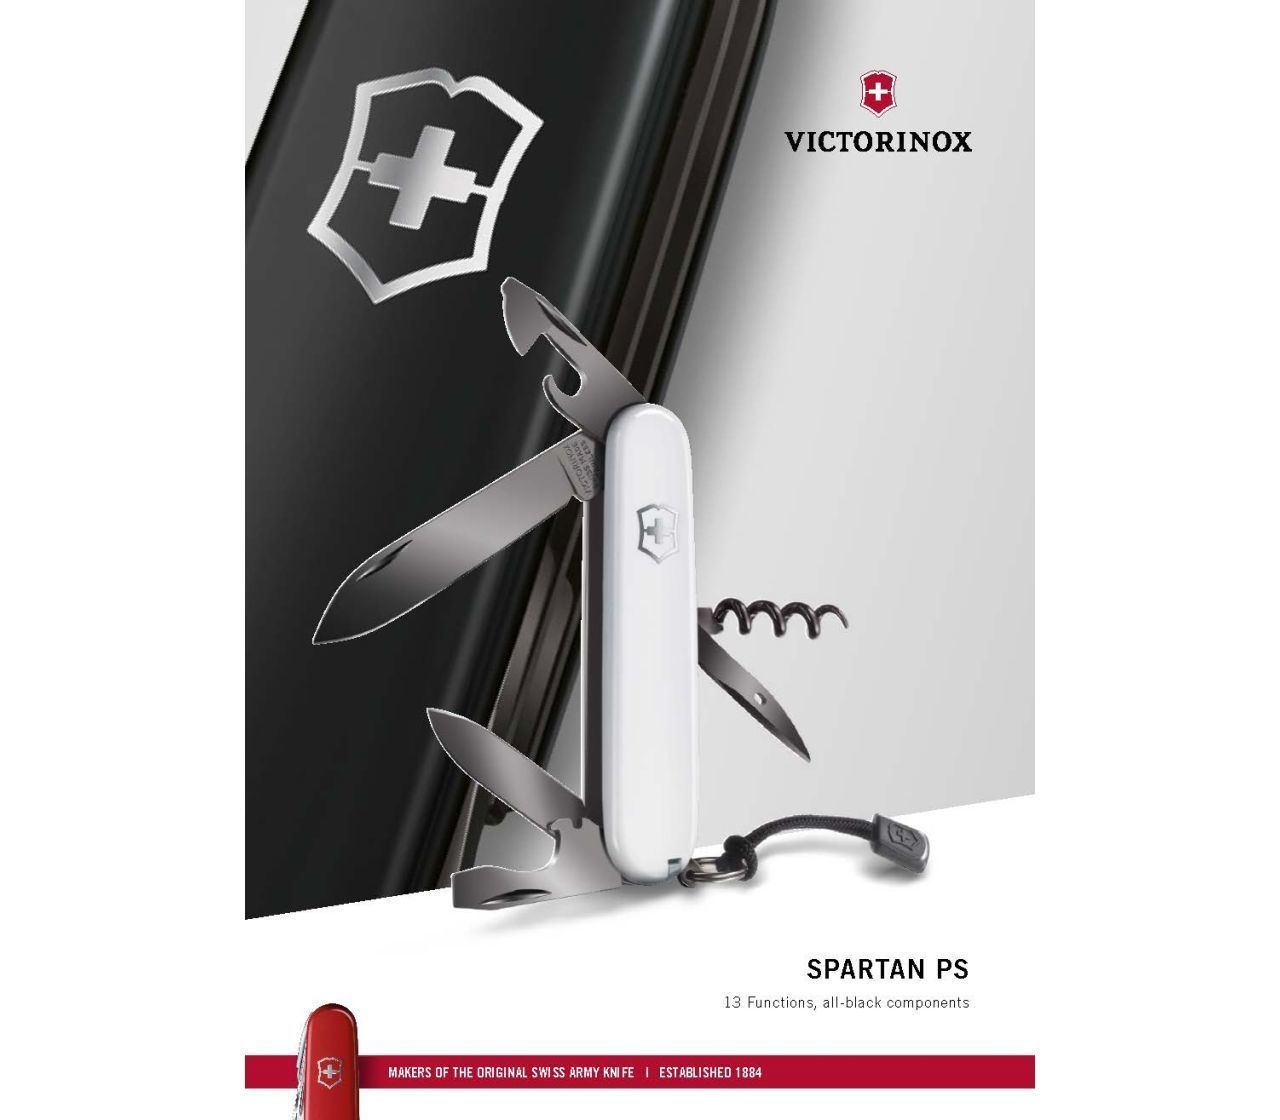 Складной нож Victorinox Spartan PS Black (1.3603.3P) 91 мм., 13 функций, подарочная упаковка- Wenger-Victorinox.Ru